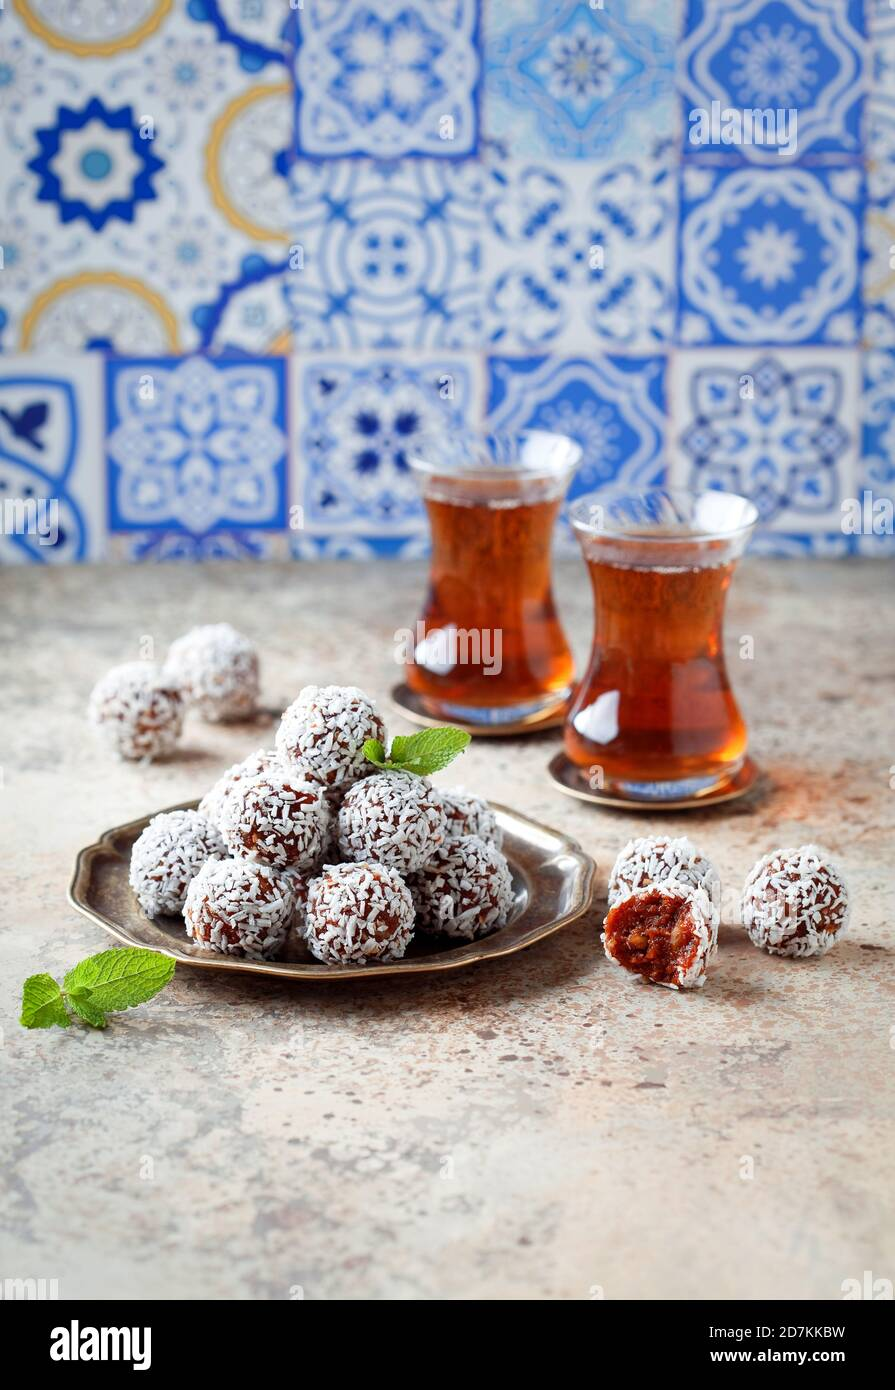 Traditional Turkish Carrot Delight (Cezerye), selective focus Stock Photo